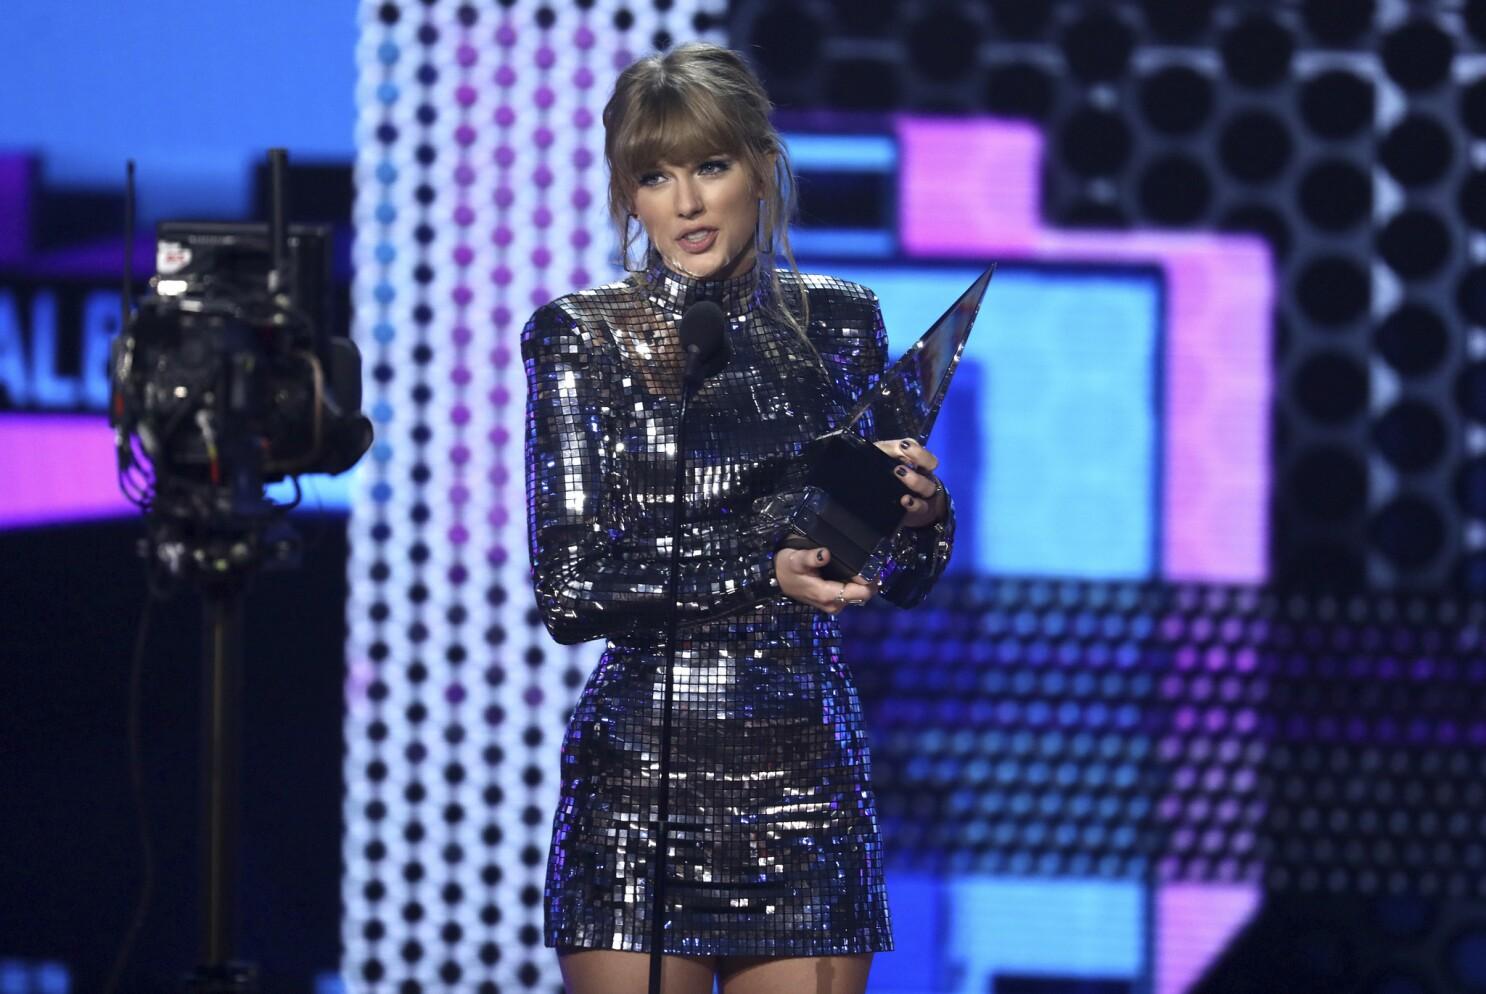 American Music Awards 2018 Taylor Swift Late Rapper Xxxtentacion Among Winners Los Angeles Times